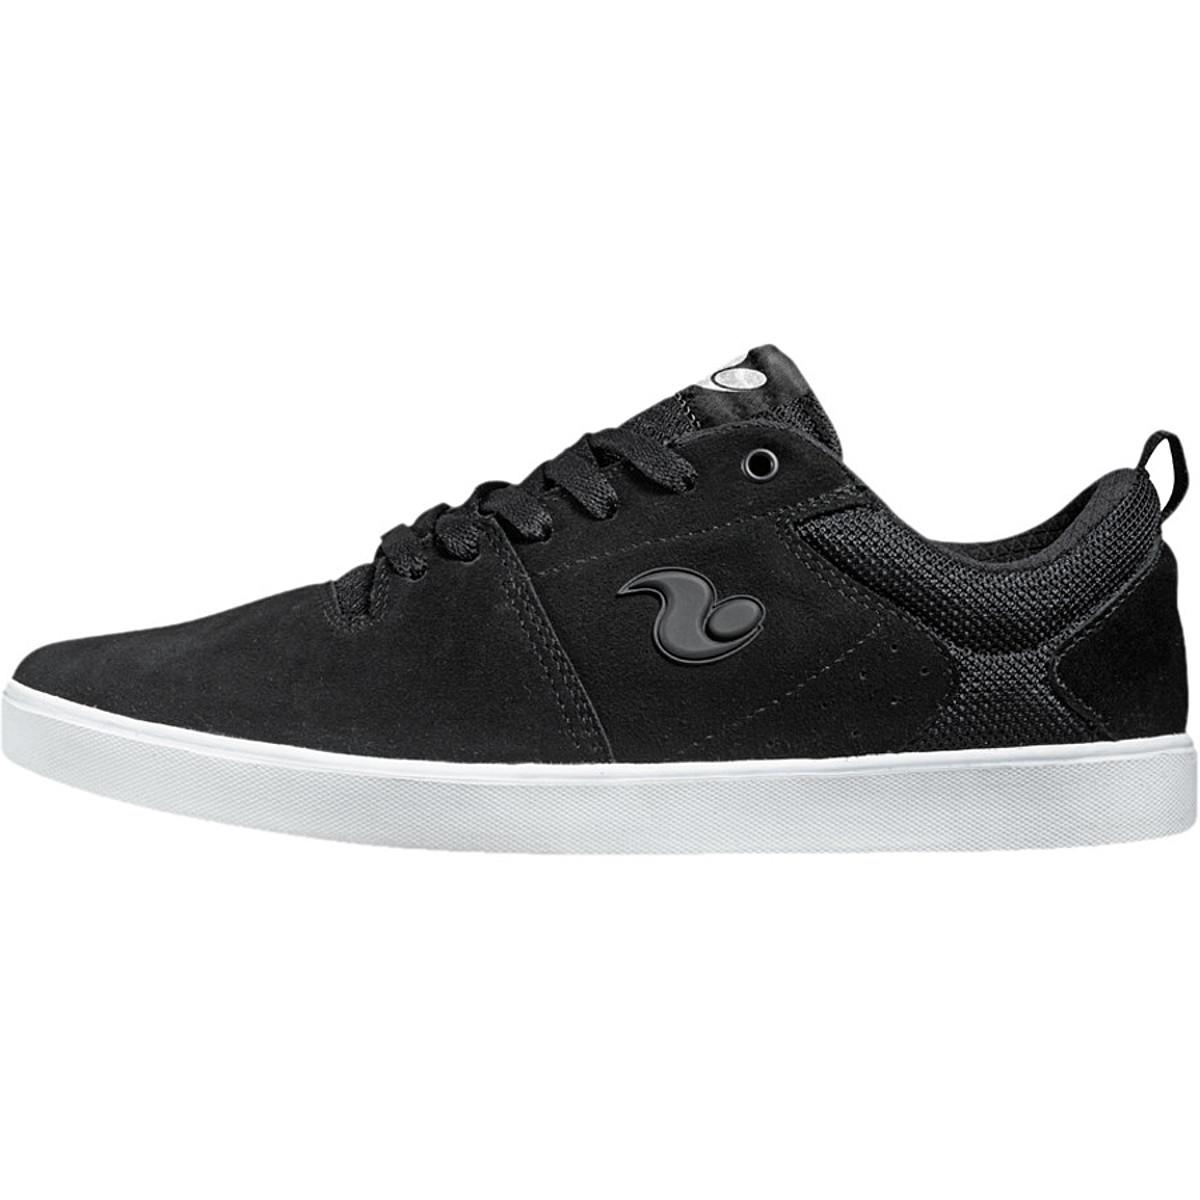 DVS Nica Skate Shoe - Men's Black Suede, 10.5